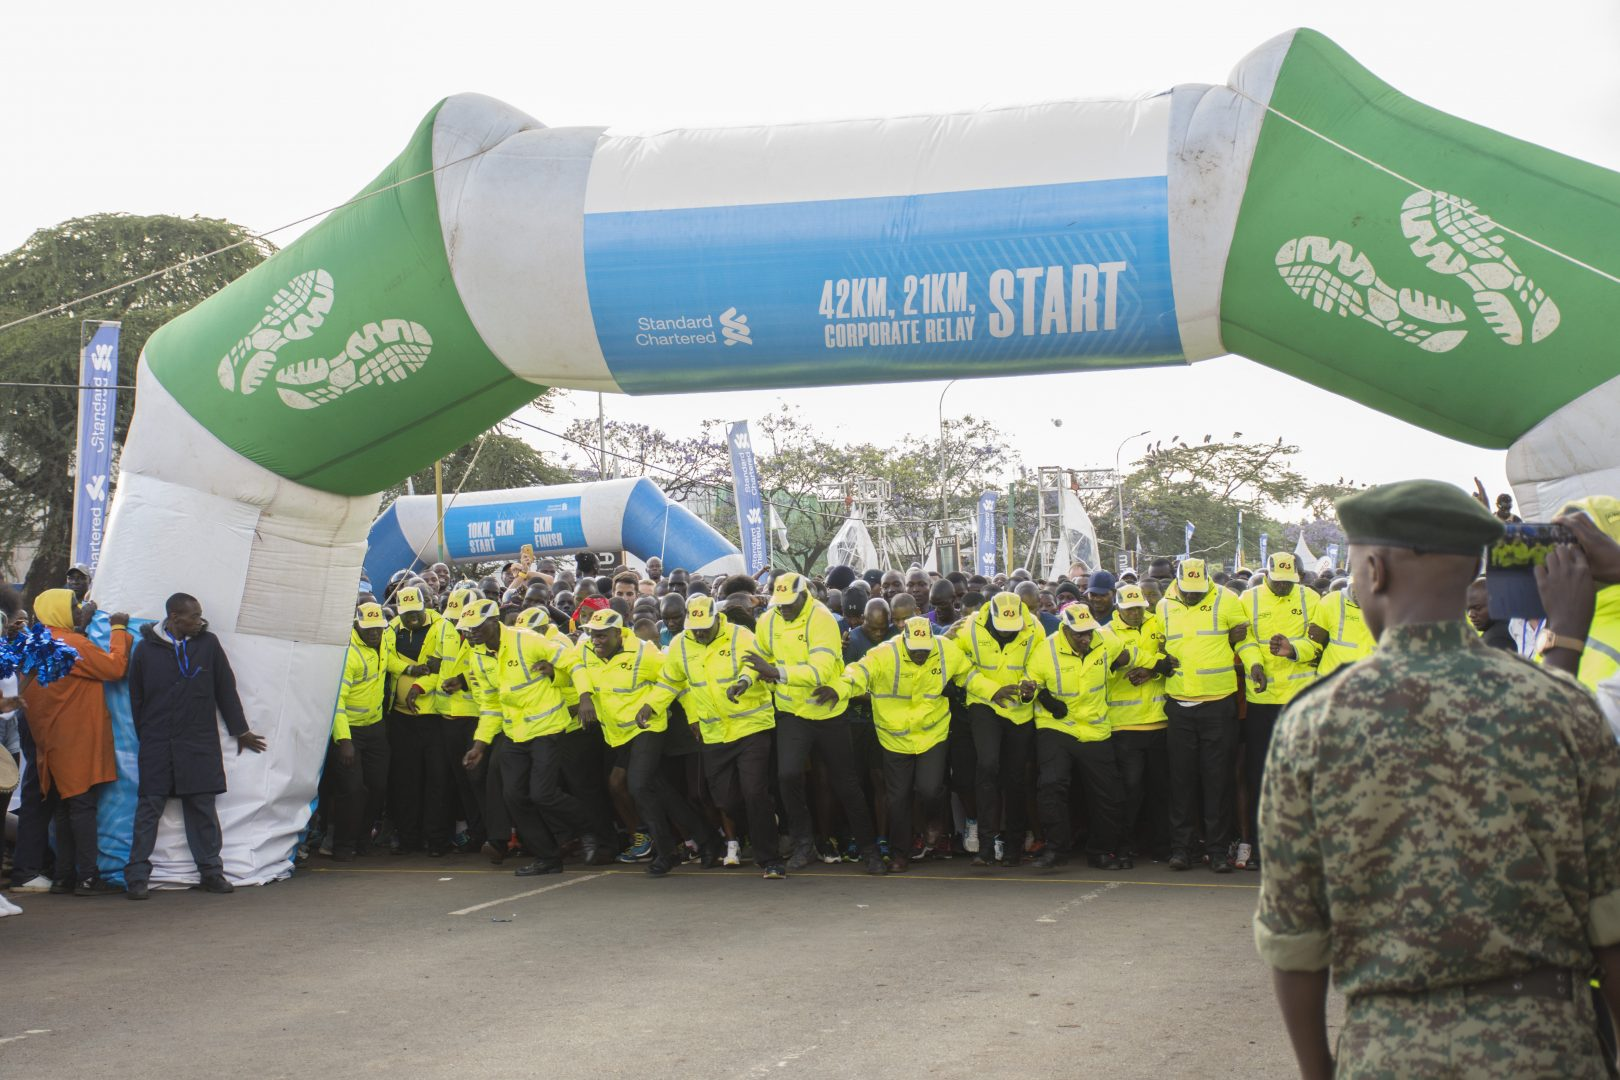 https://www.nairobimarathon.com/wp-content/uploads/2021/07/DSC_2967.jpg